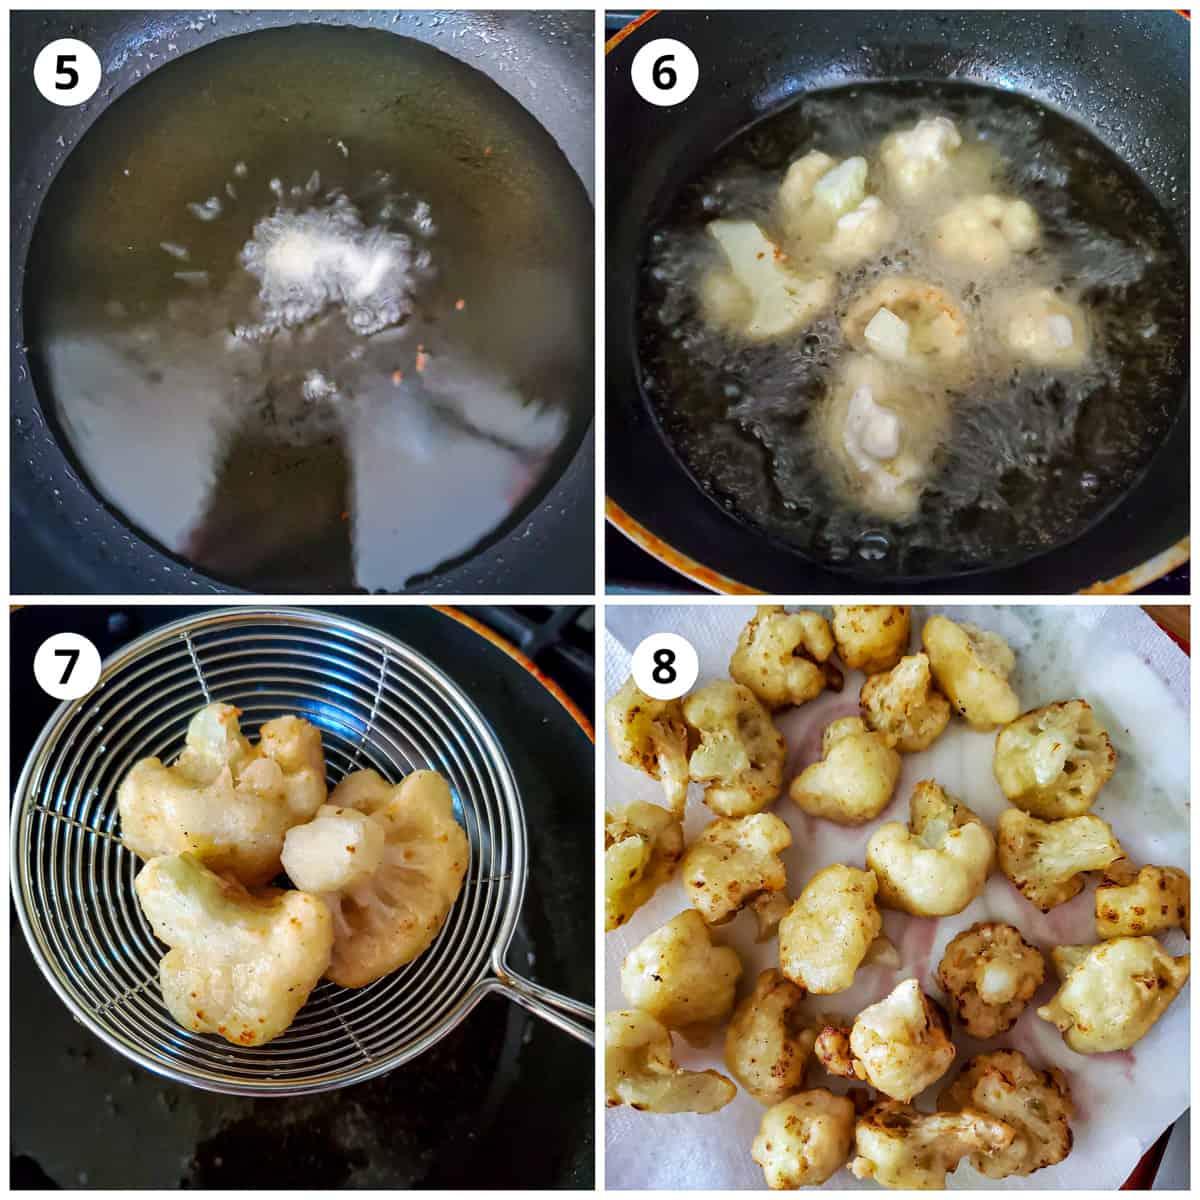 deep frying batter coated cauliflower florets